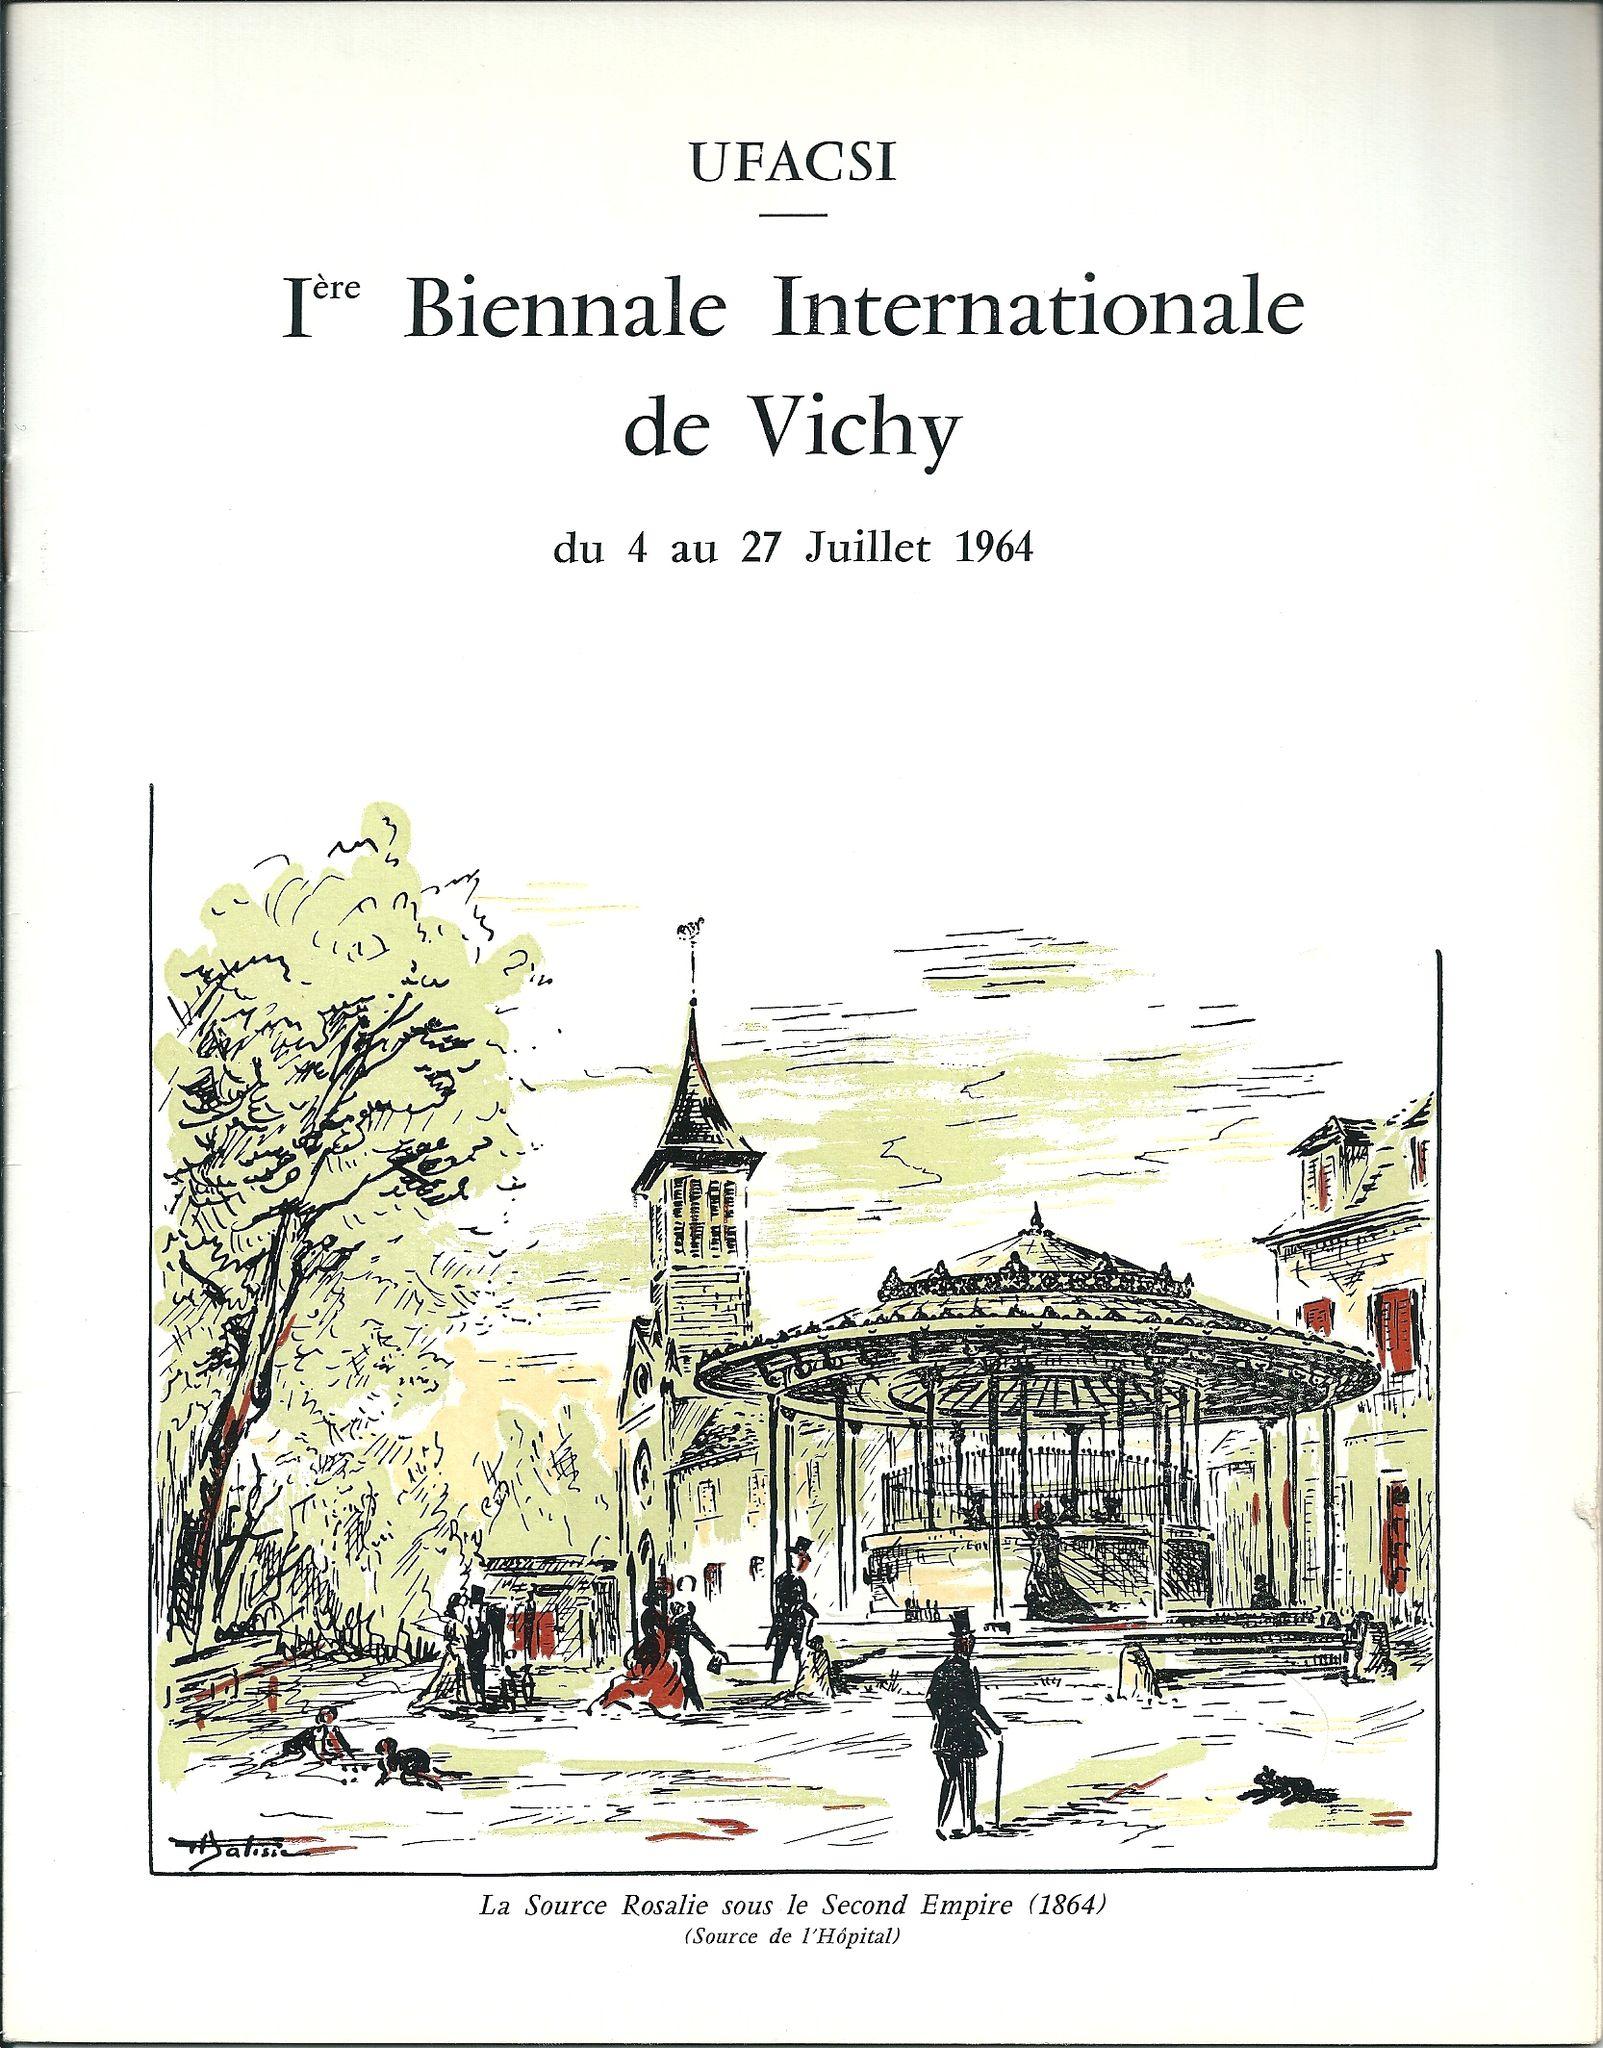 UFACSI - 1ère Biennale Internationale de Vichy 1964